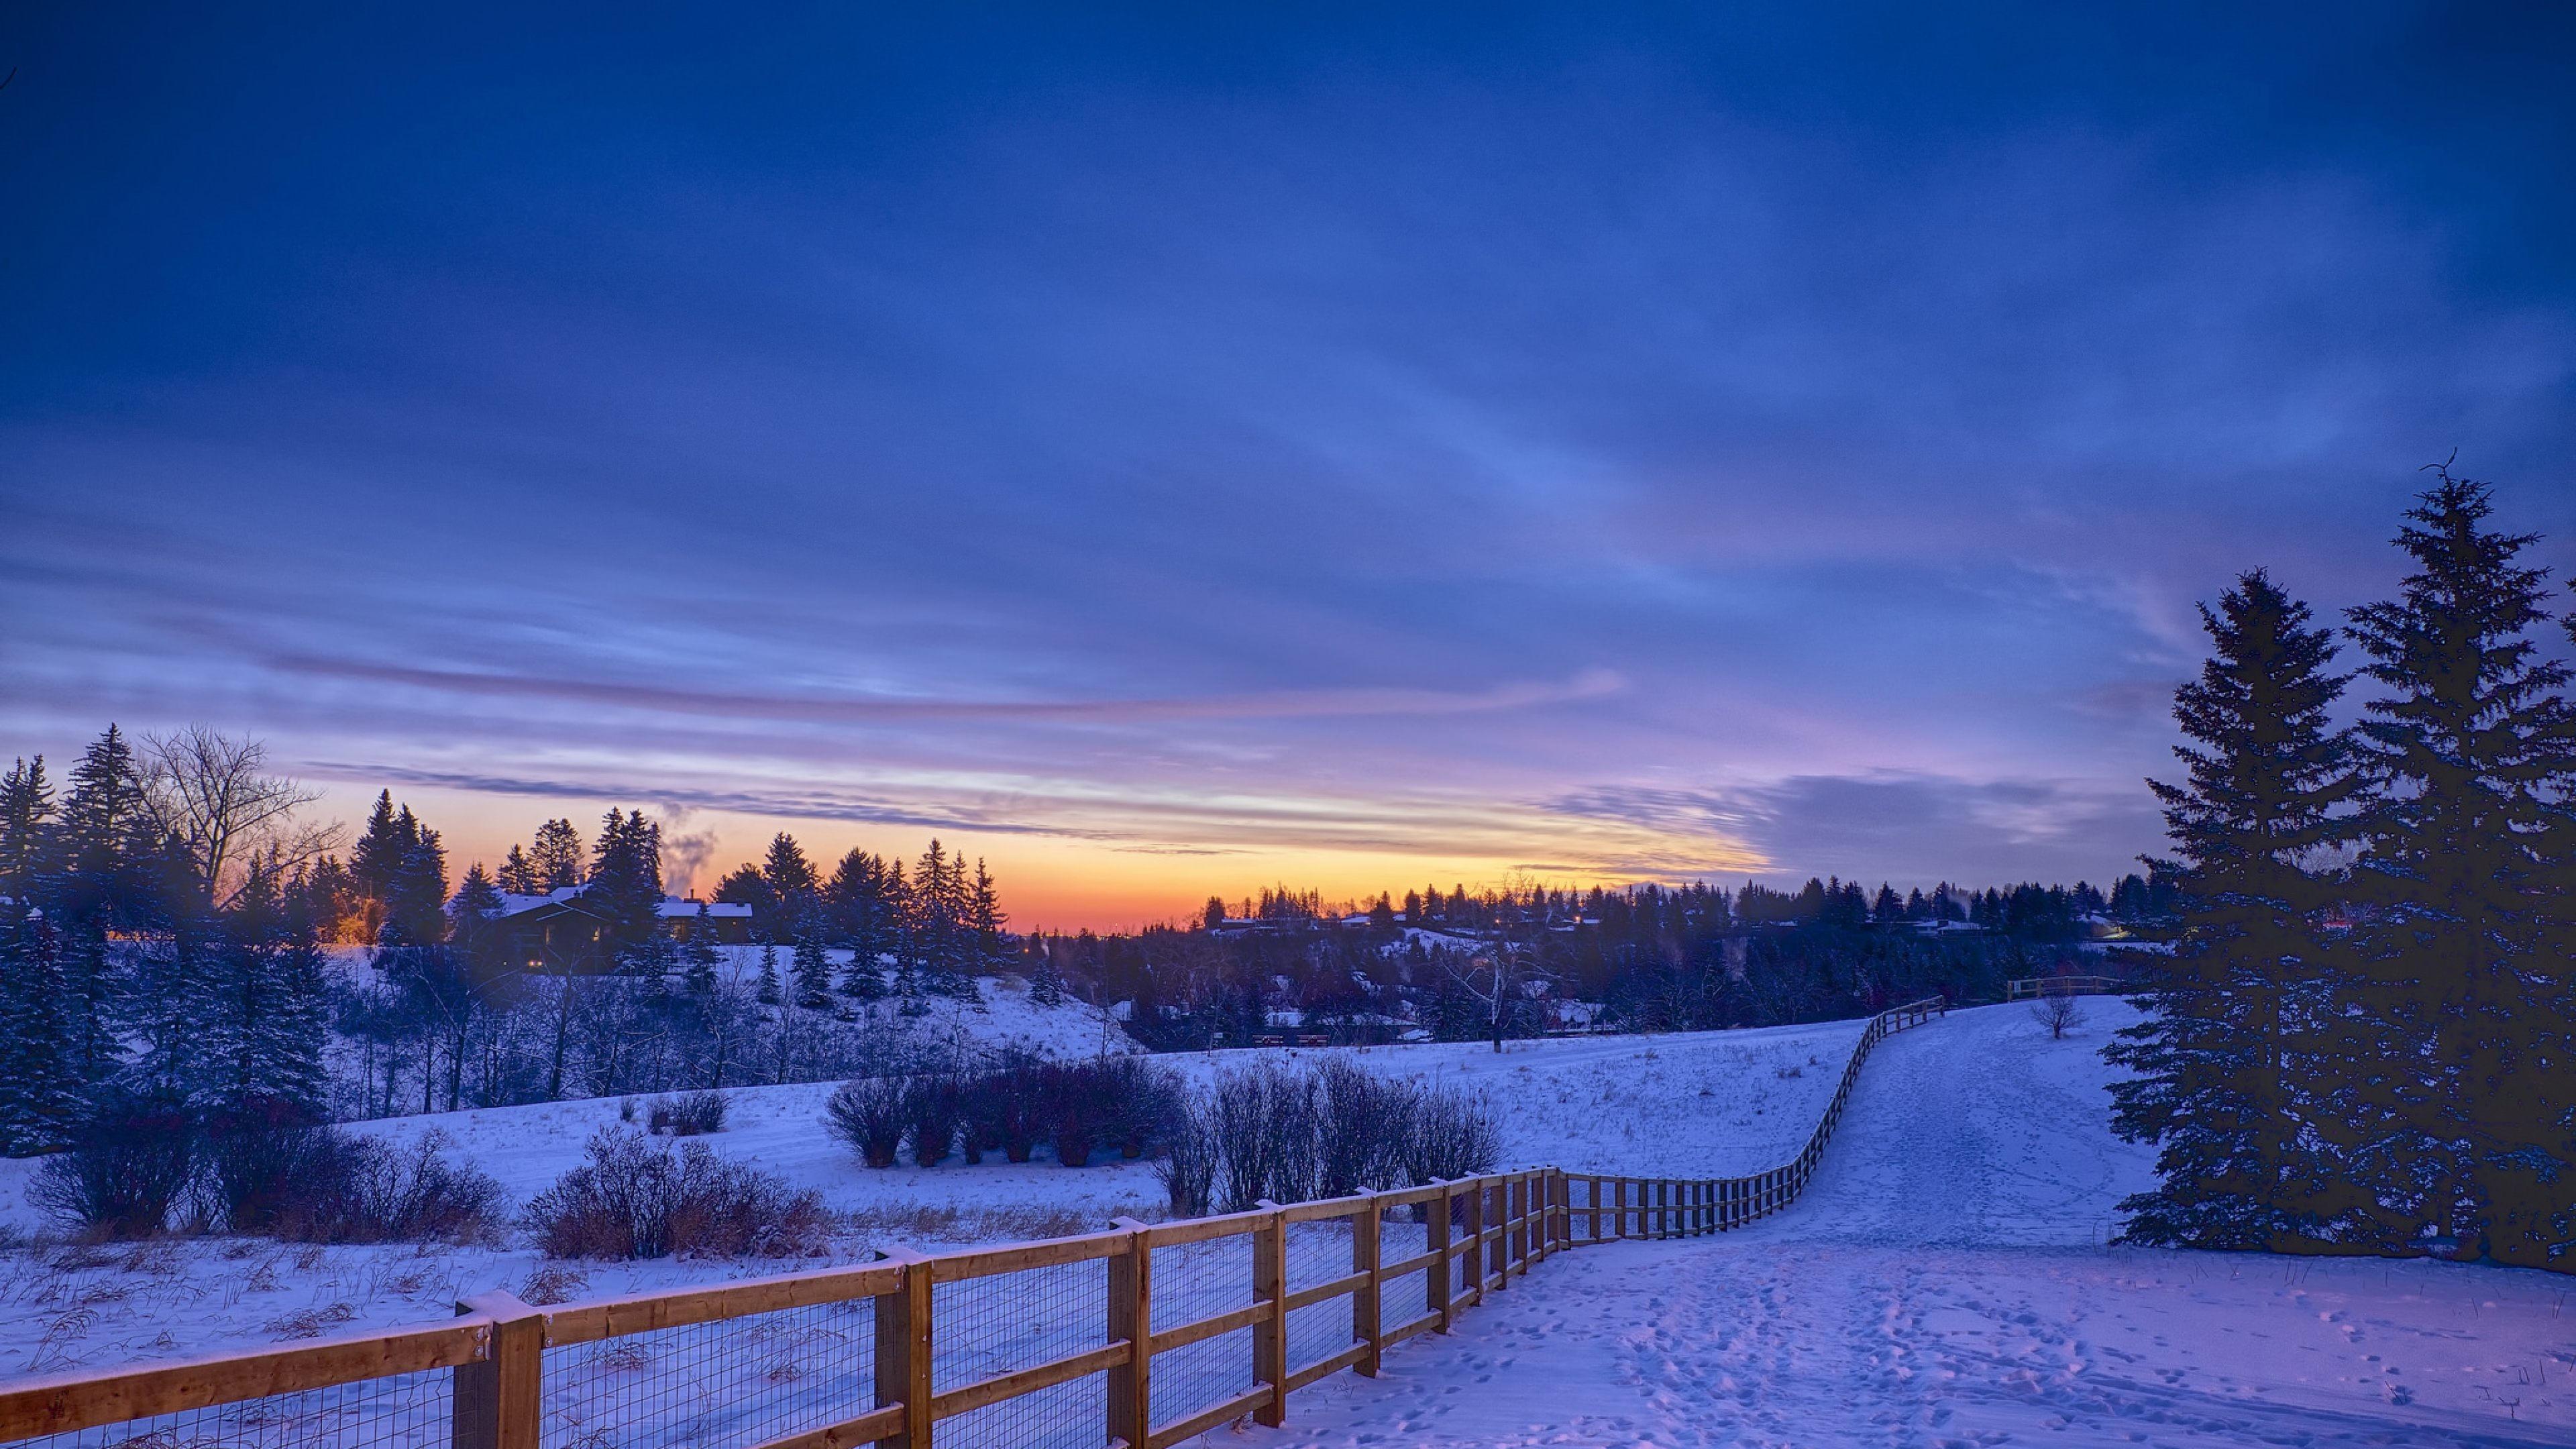 4K Winter Wallpaper (28+ images)